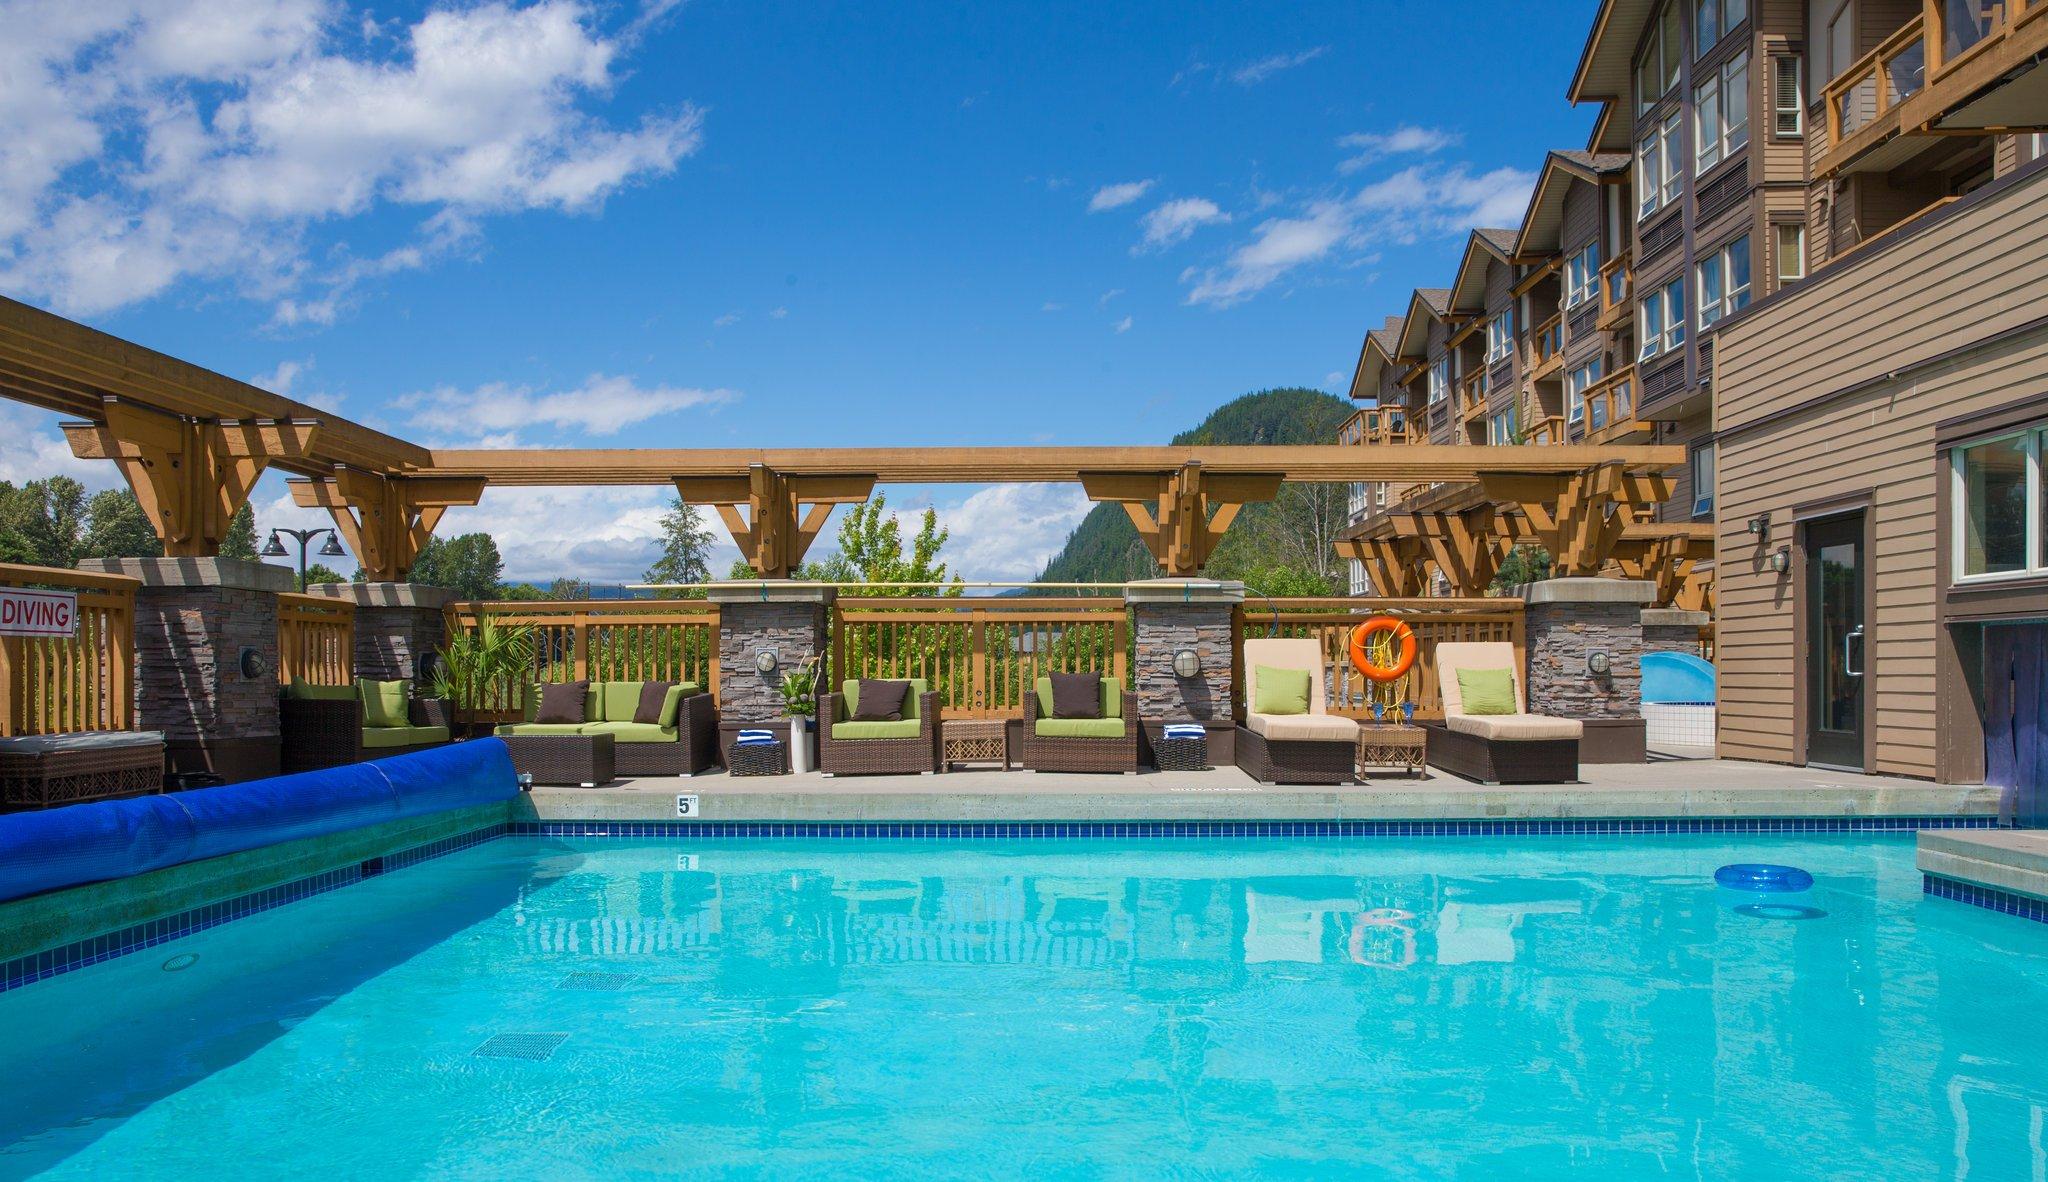 Executive Suites Hotel & Resort